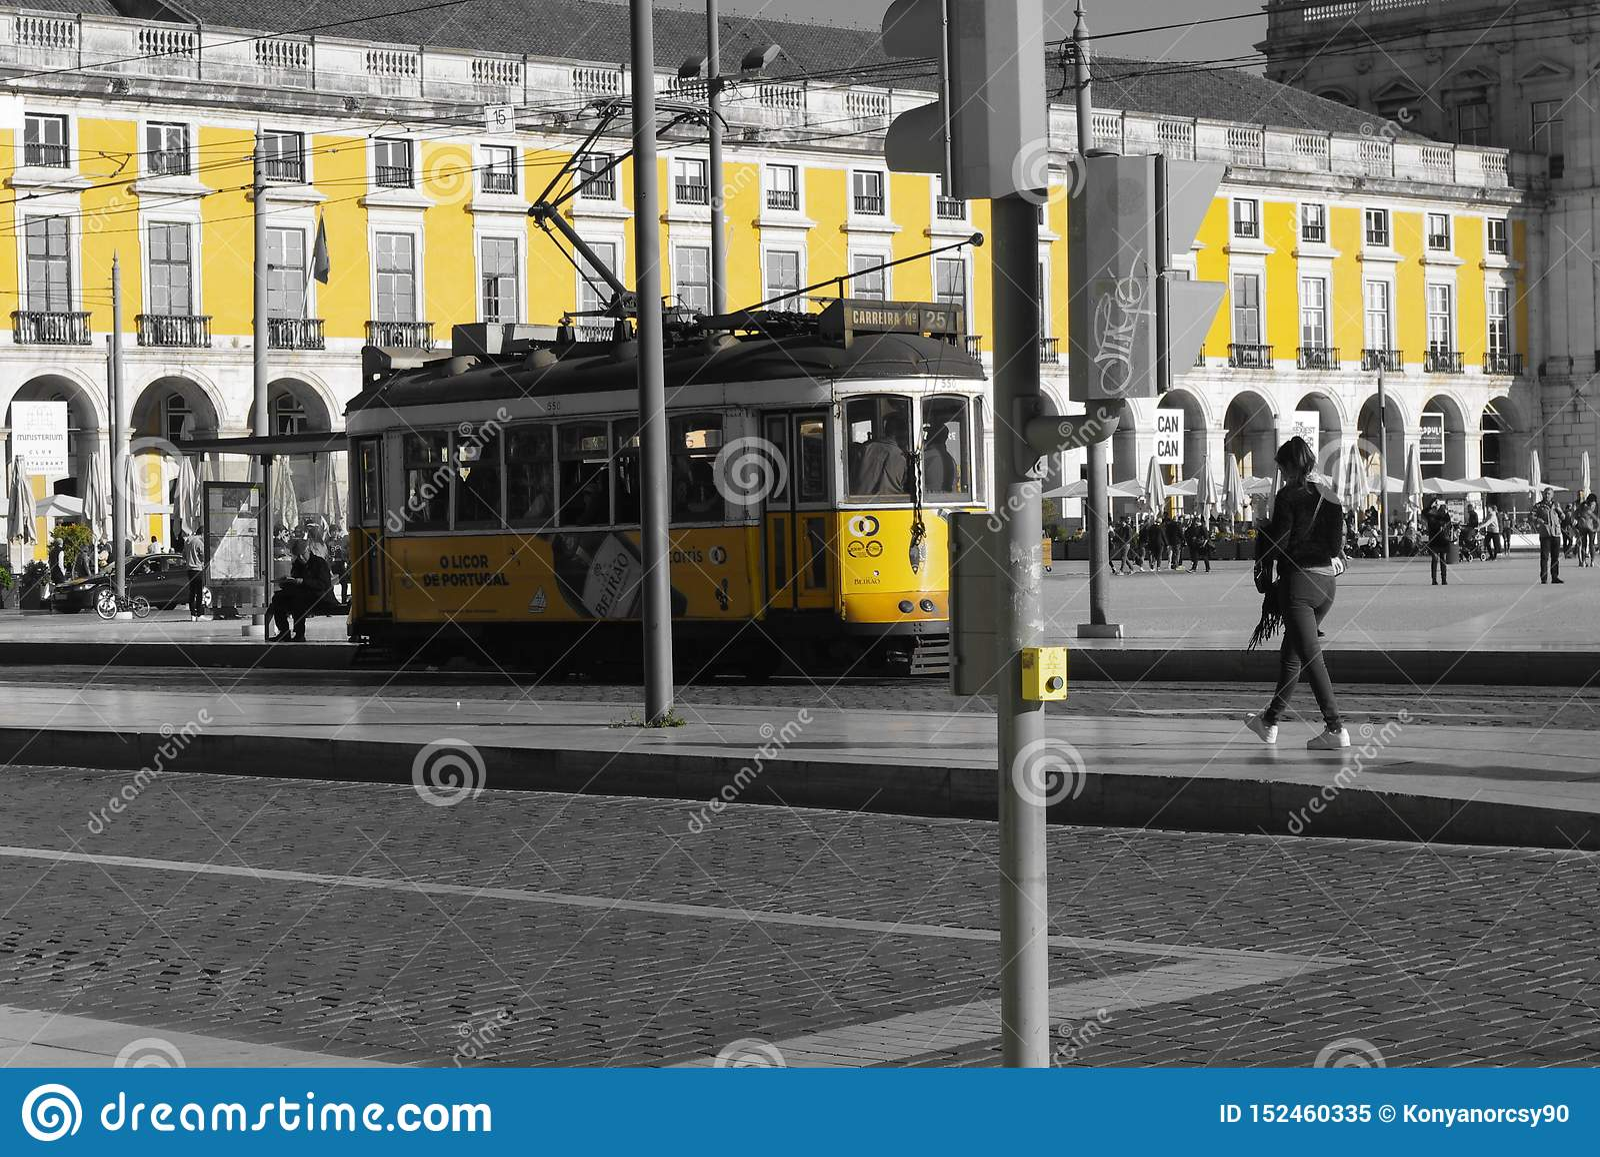 Yellow tram&building of Lisboa